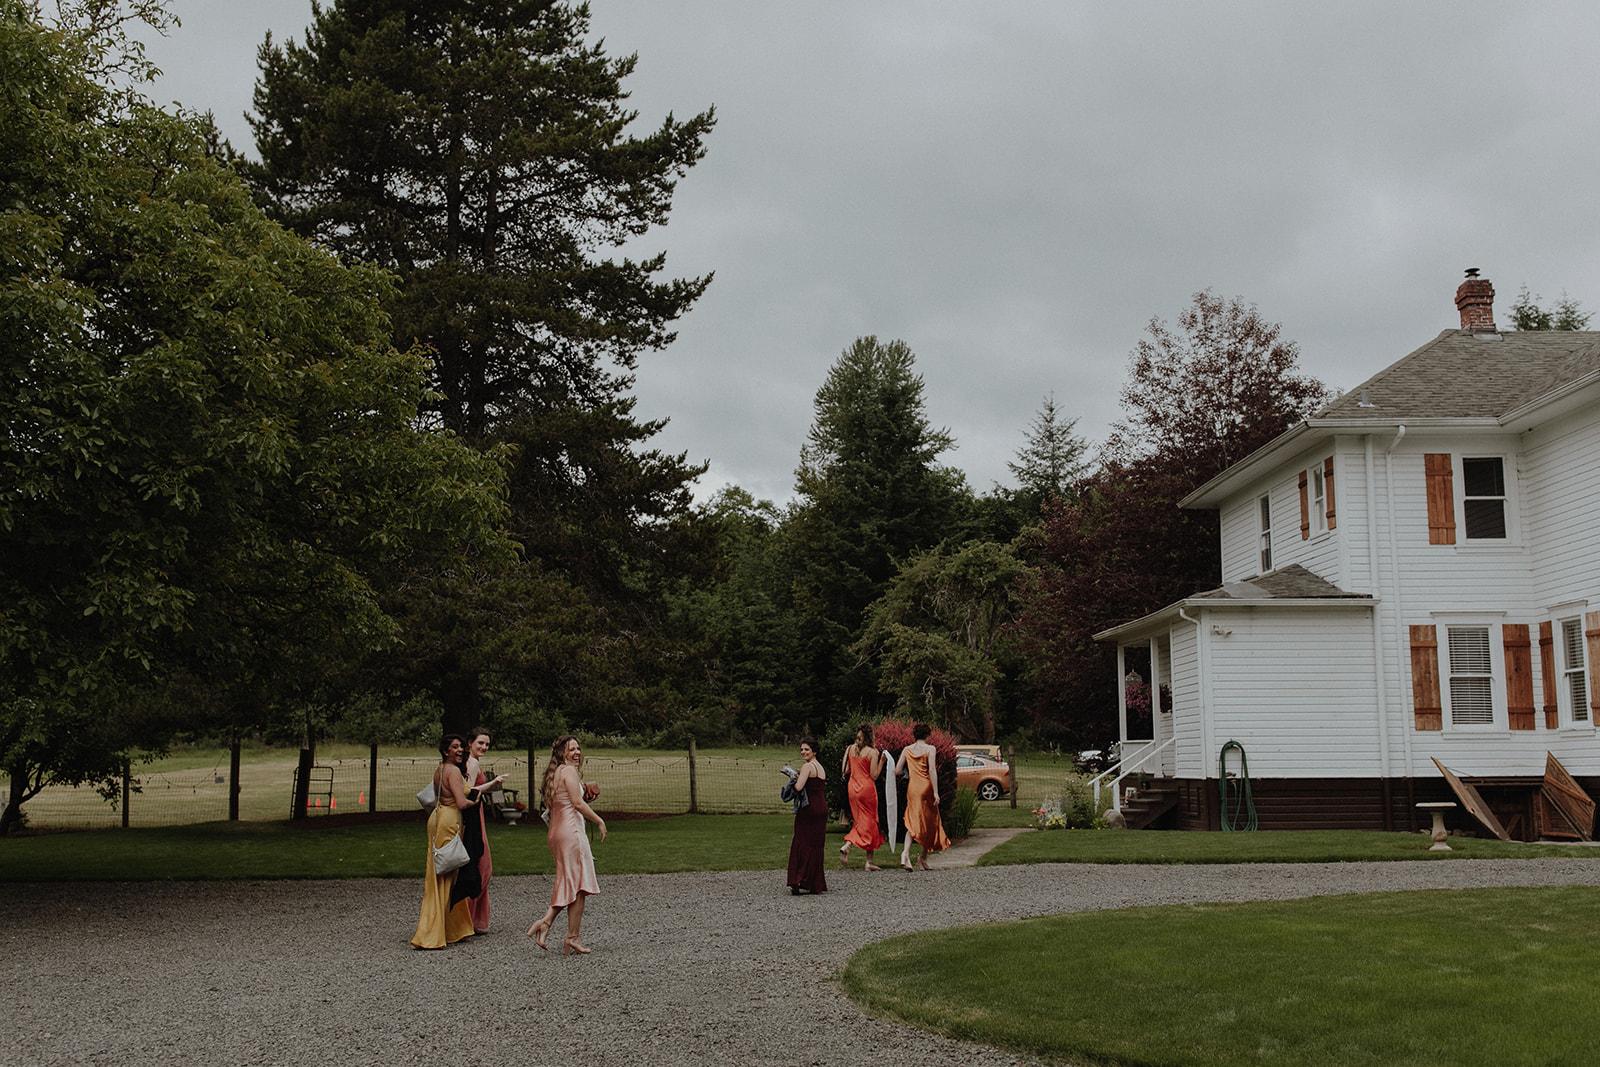 cortney_skye_wedding_june2019-55.jpg